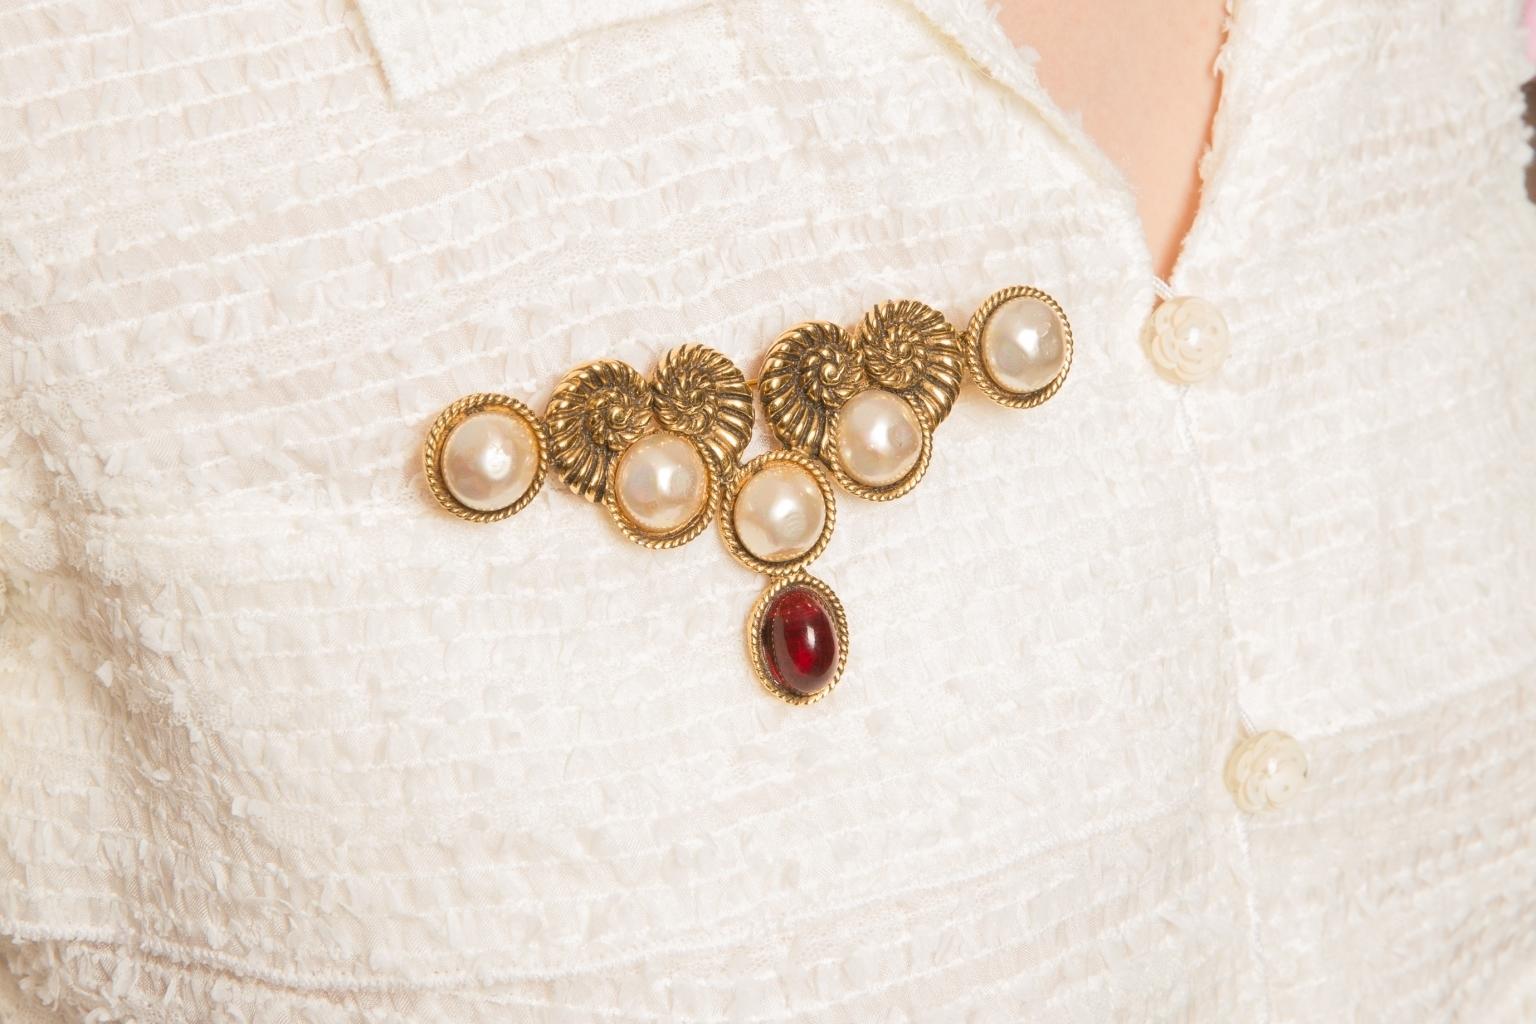 Эффектная крупная брошь с жемчугом и стеклом Грипуа от Chanel, 1984  |  Chanel 1984 Faux Pearl and Gripoix Pin Brooch